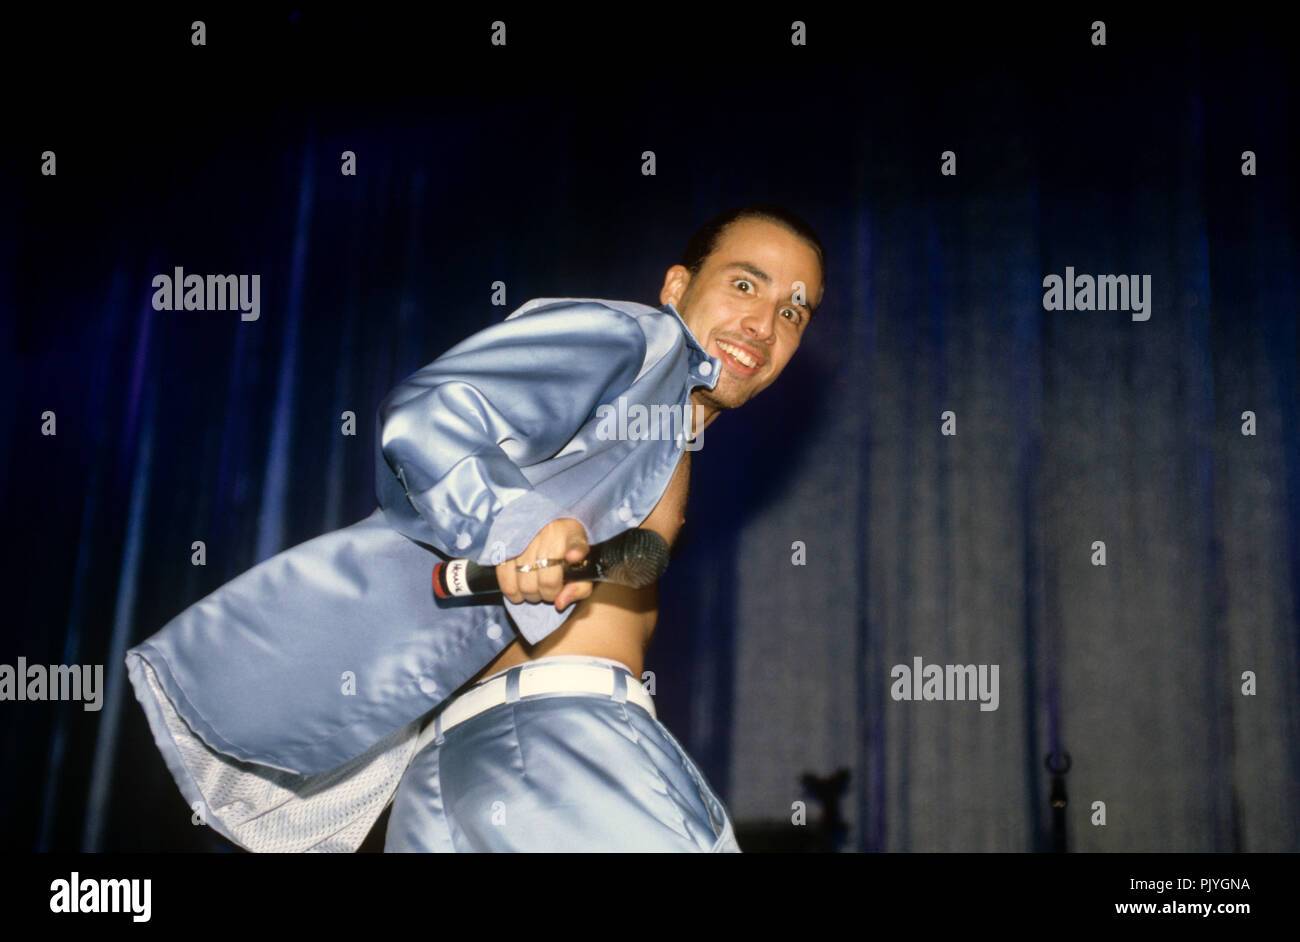 Howie Dorough (Backstreet Boys) on 15.07.1998 in Washington. | usage worldwide - Stock Image